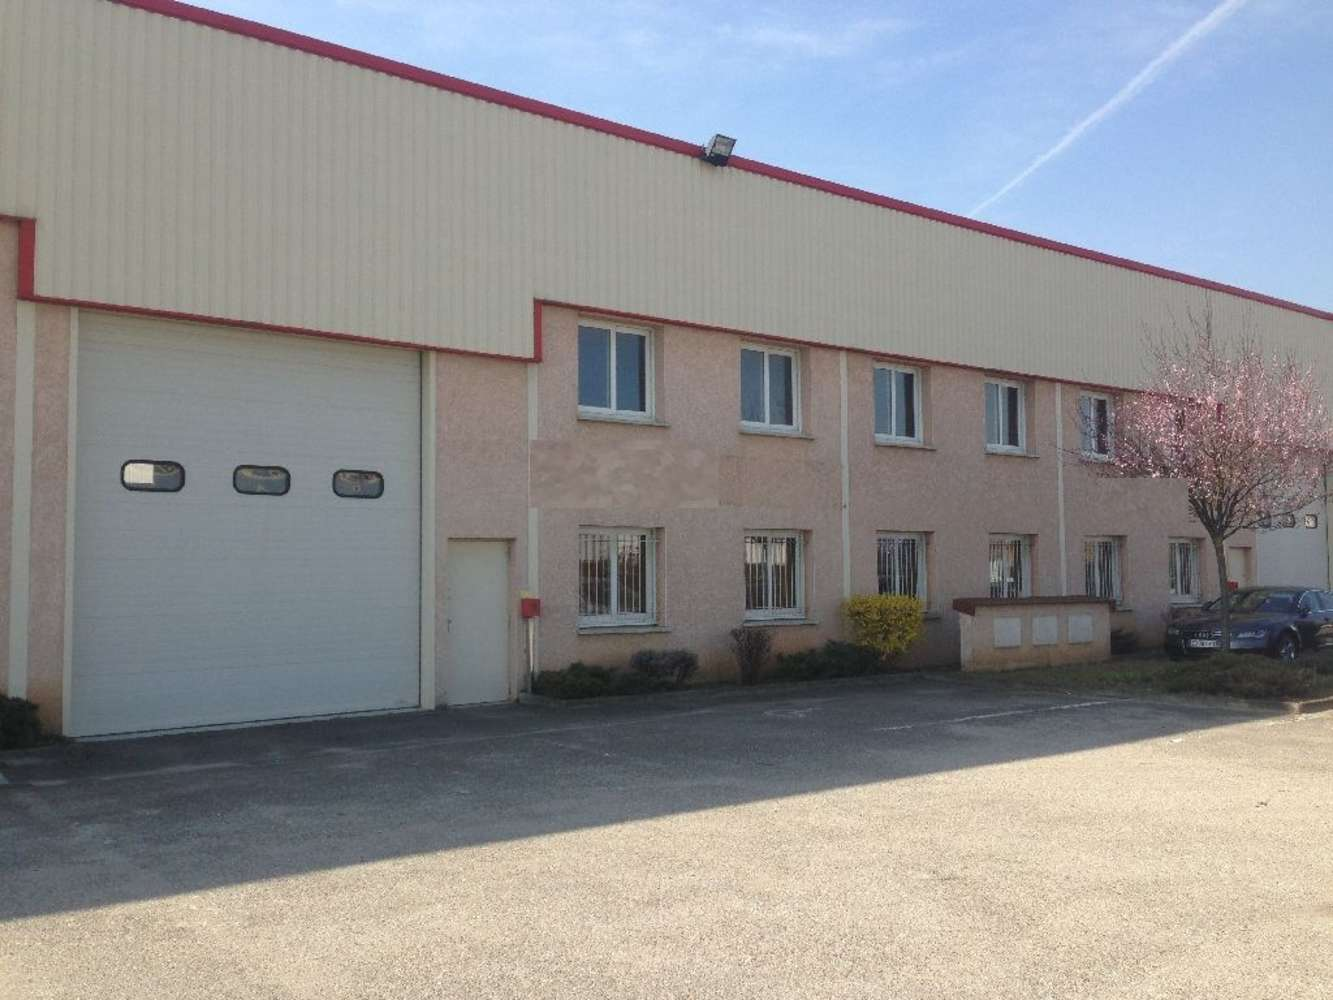 Activités/entrepôt Chassieu, 69680 - Location entrepot Chassieu - Lyon (69) - 10086066